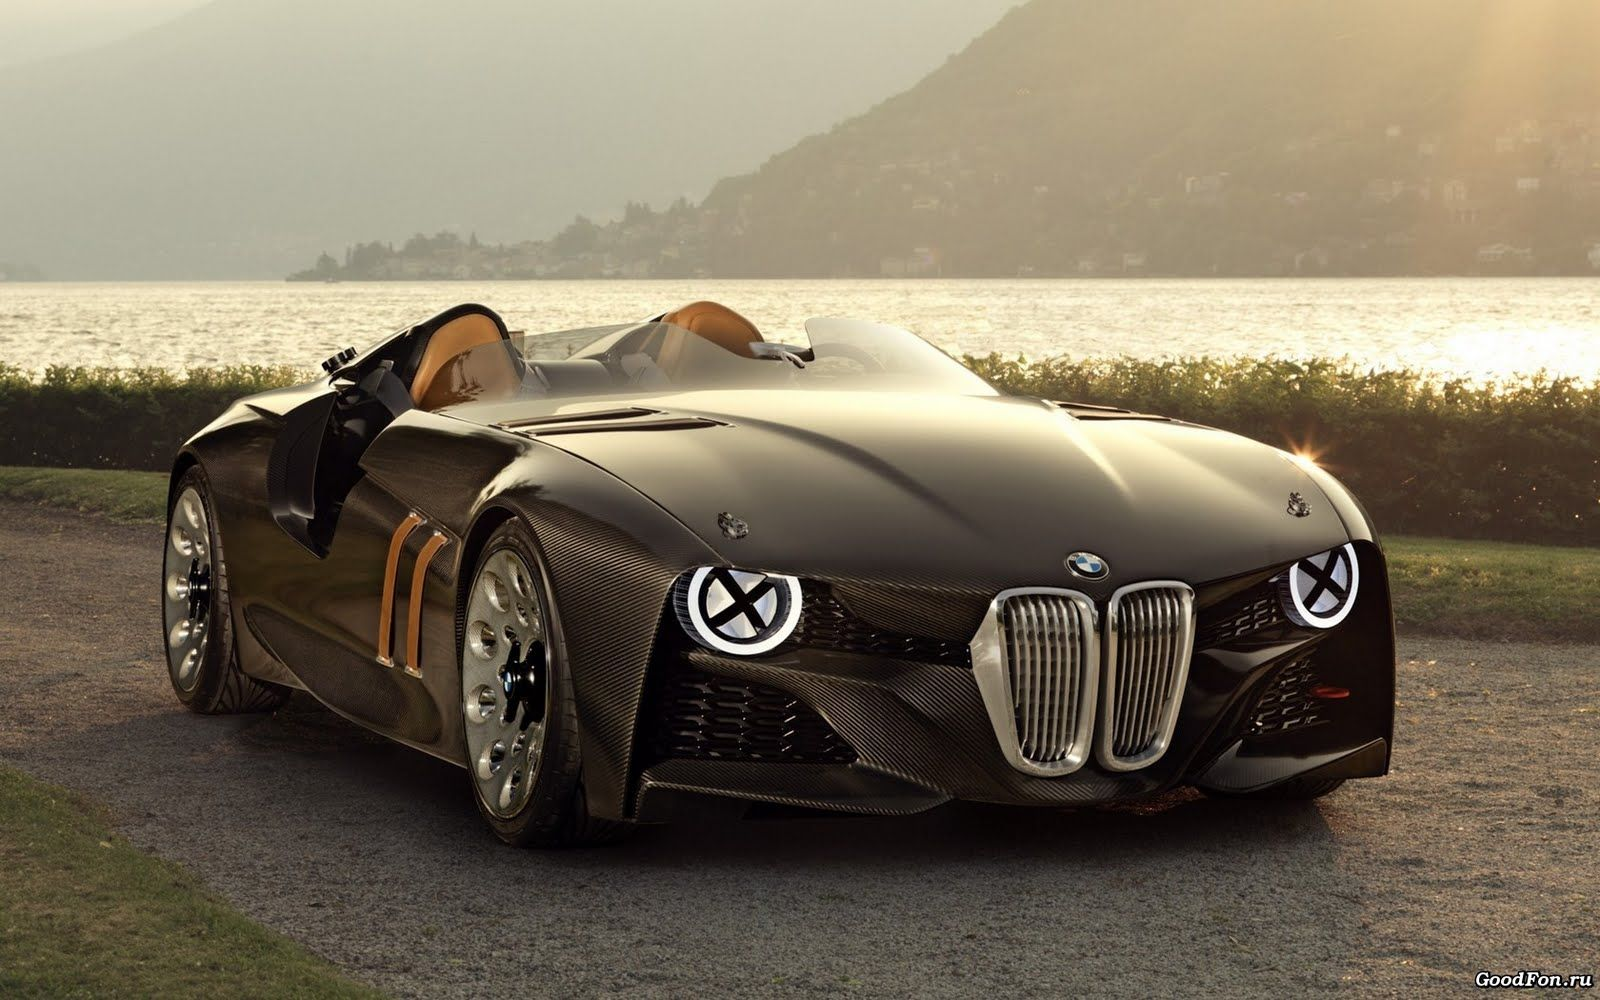 Bmw Sports Stylish Luxury Royal Cars World Beautiful Hd Wallpaper 786 Bmw 328 Bmw Concept Bmw Concept Car